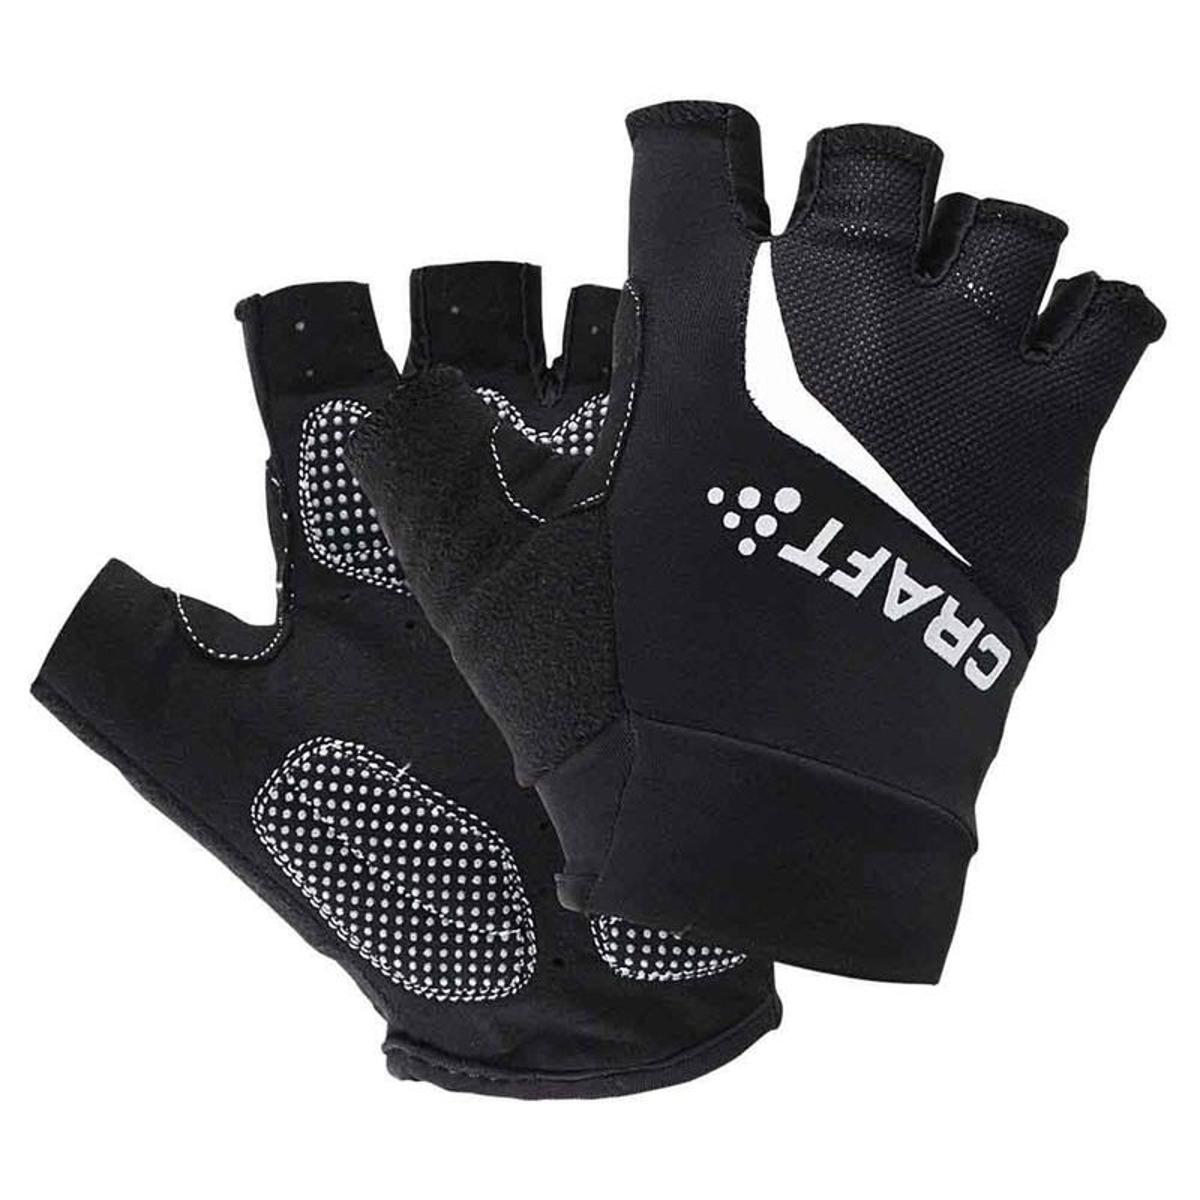 Gants courts Craft Classic Glove 1